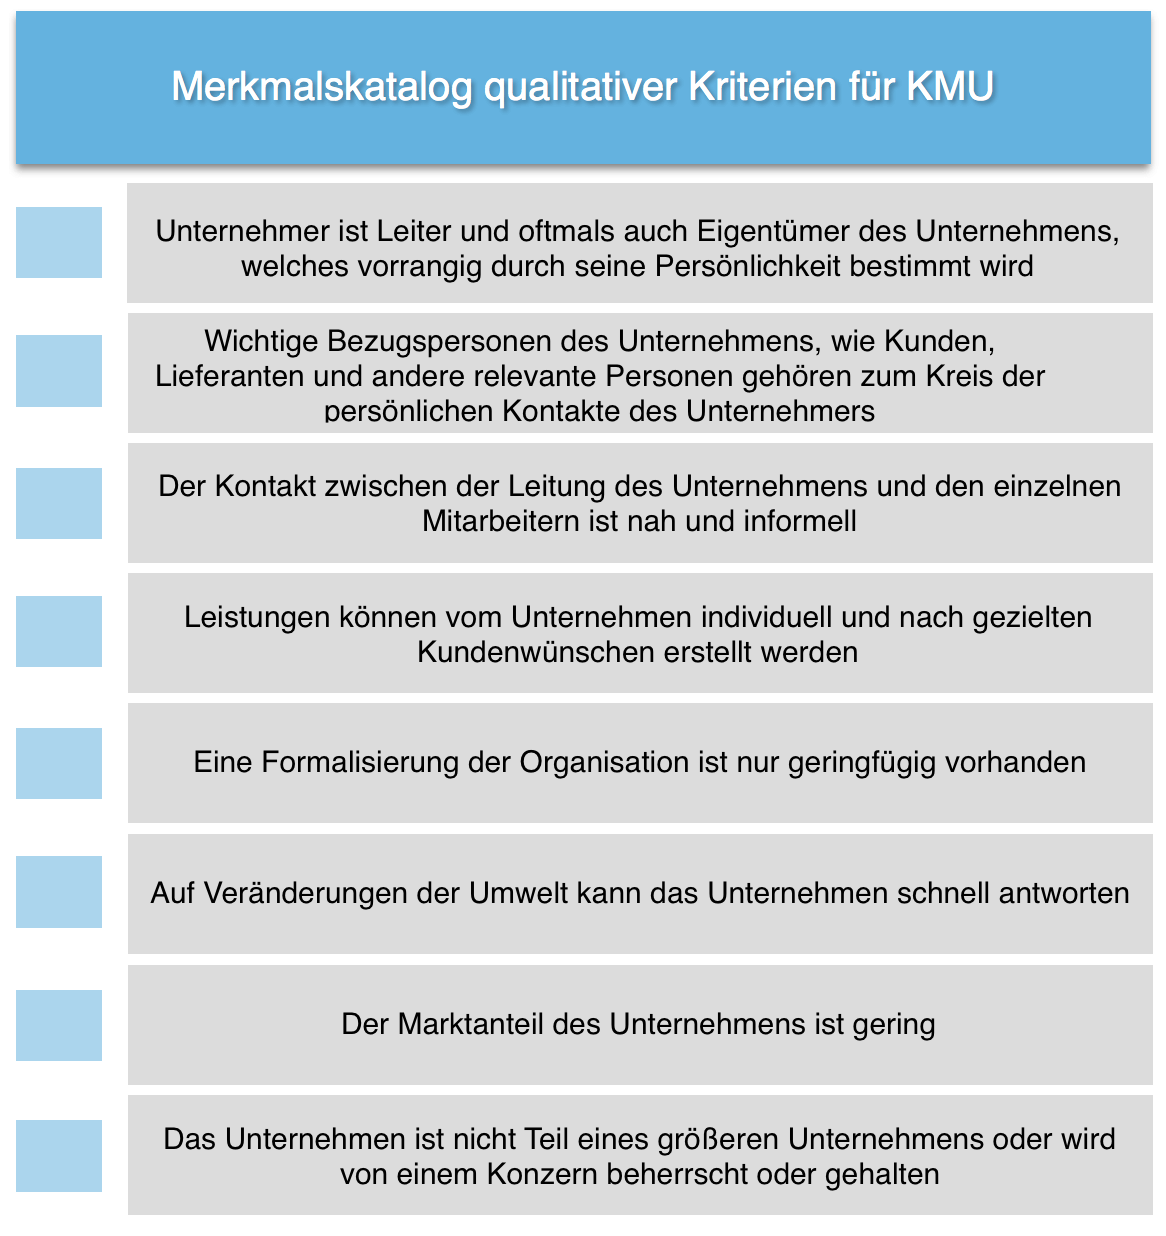 Abbildung 4: Merkmalskatalog für KMU (in Anlehnung an Mugler, 2008, 25ff.)